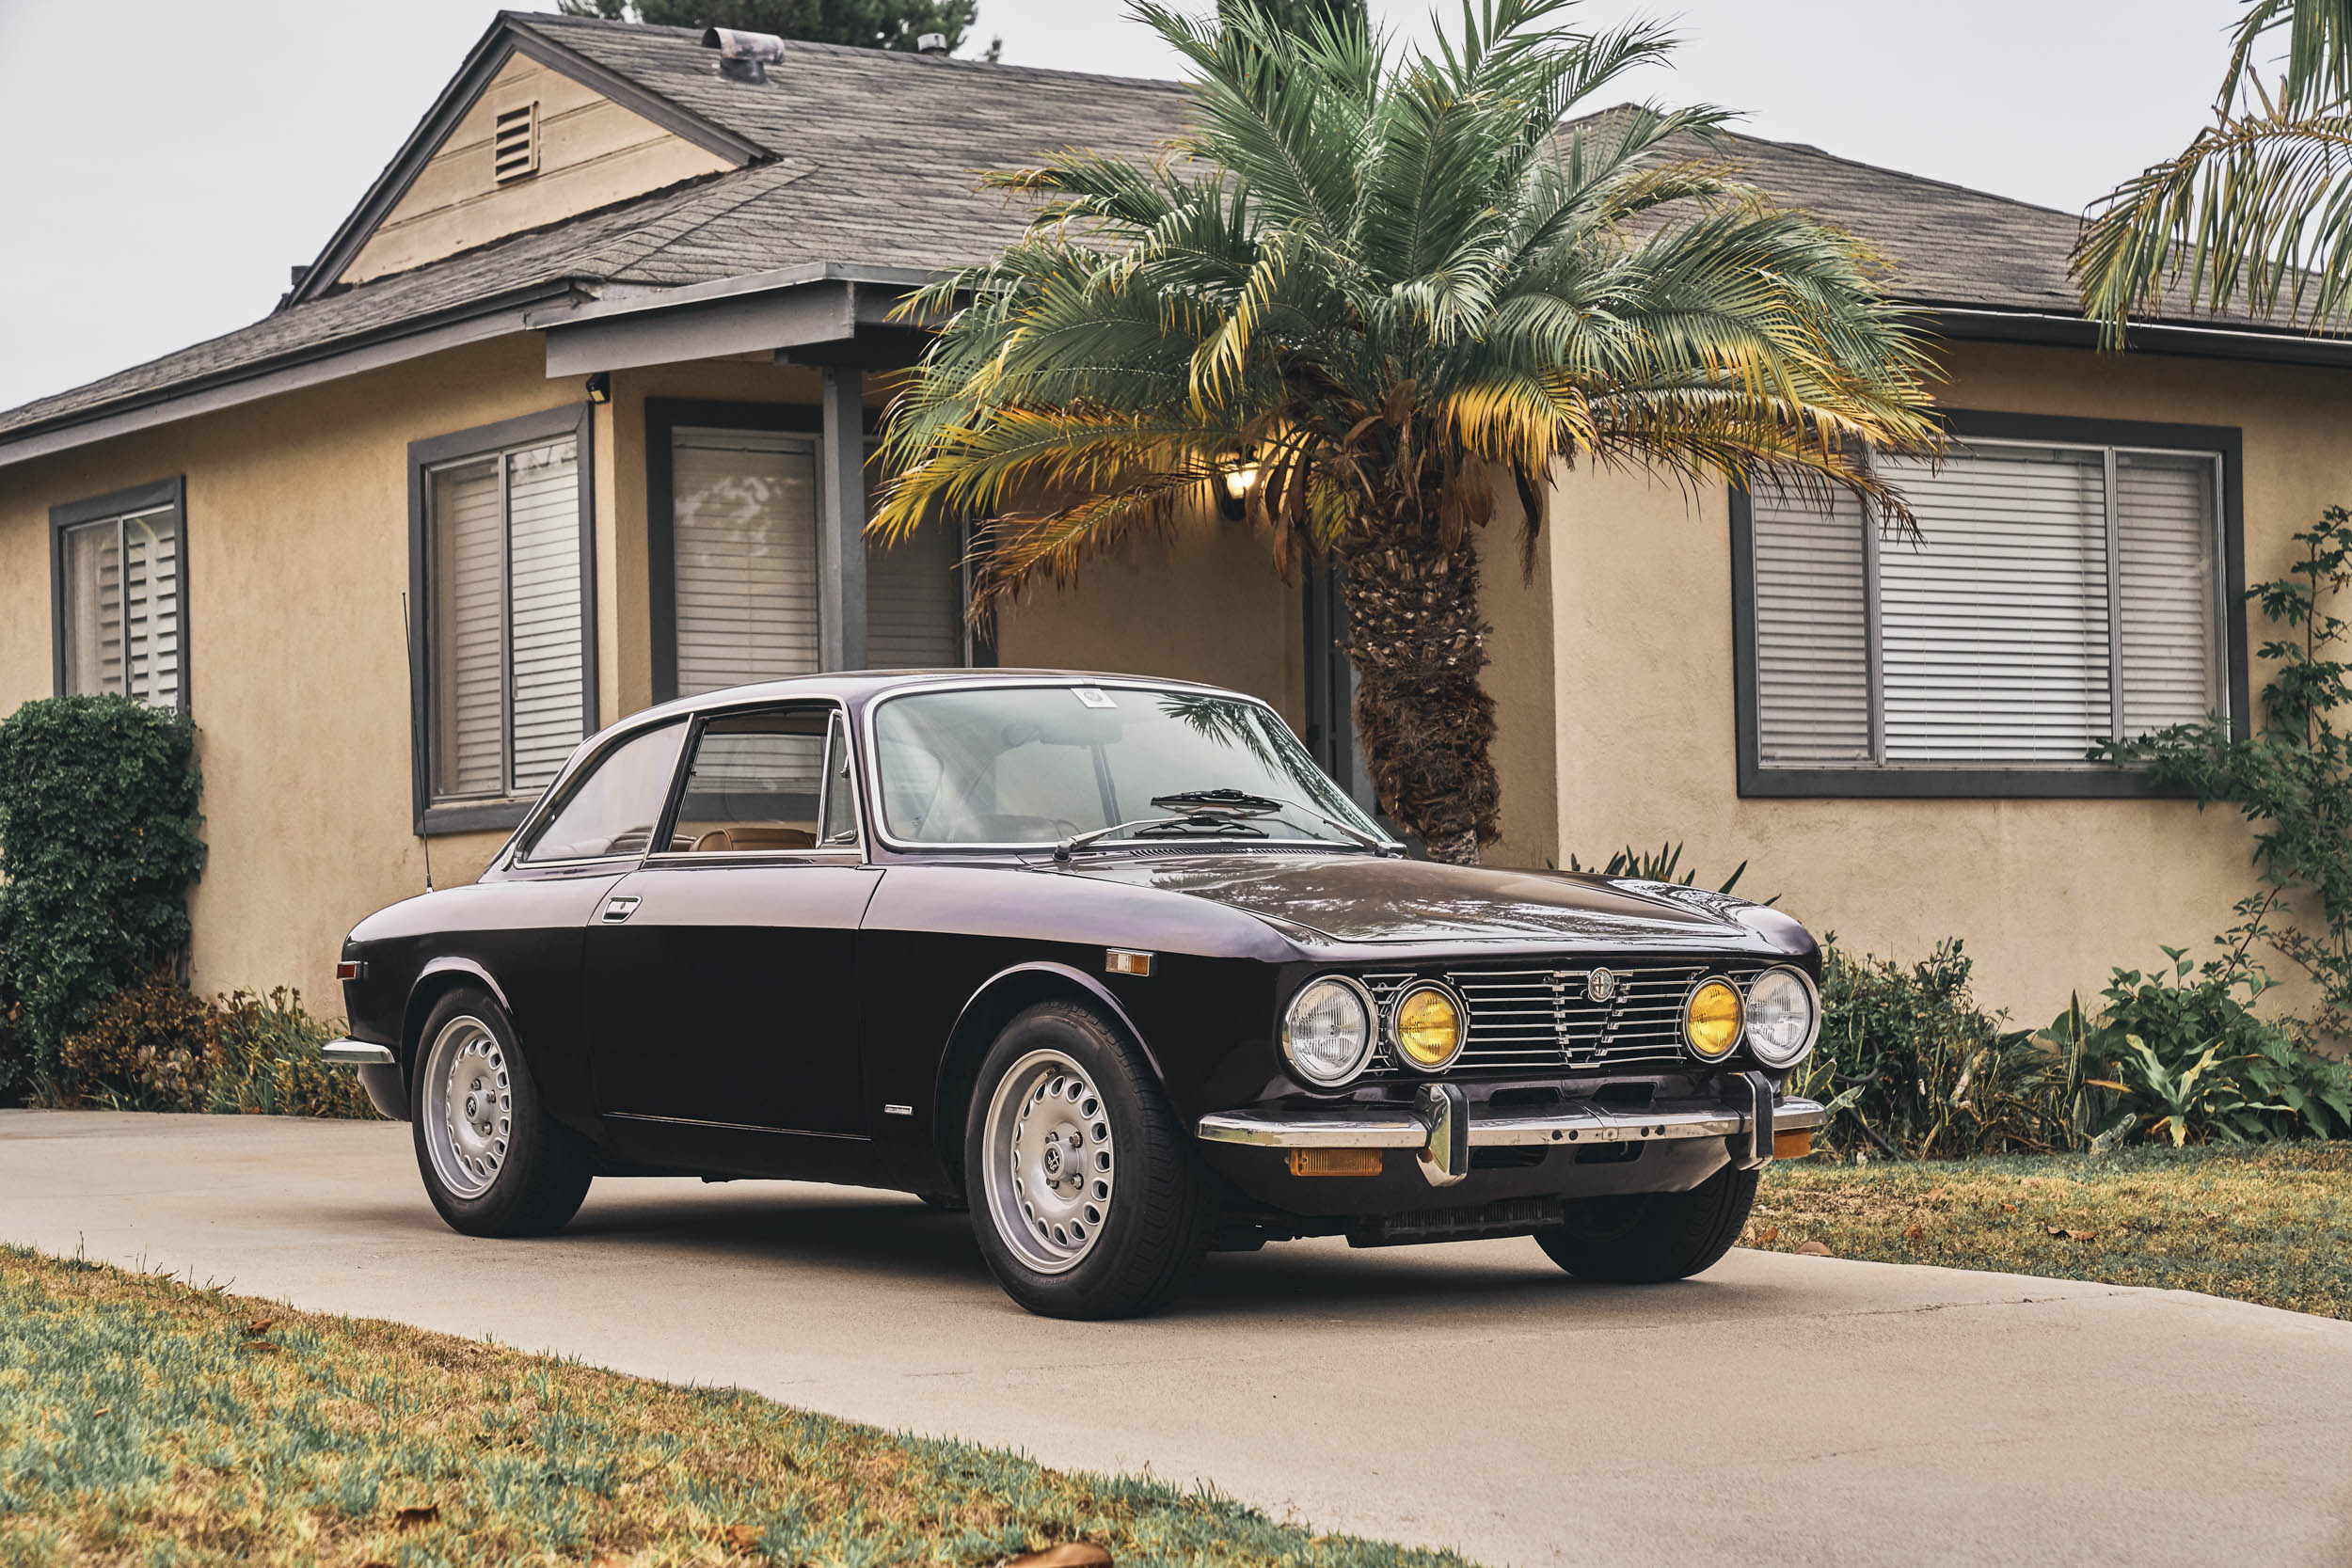 1974 Alfa Romeo GTV 2000 in the driveway